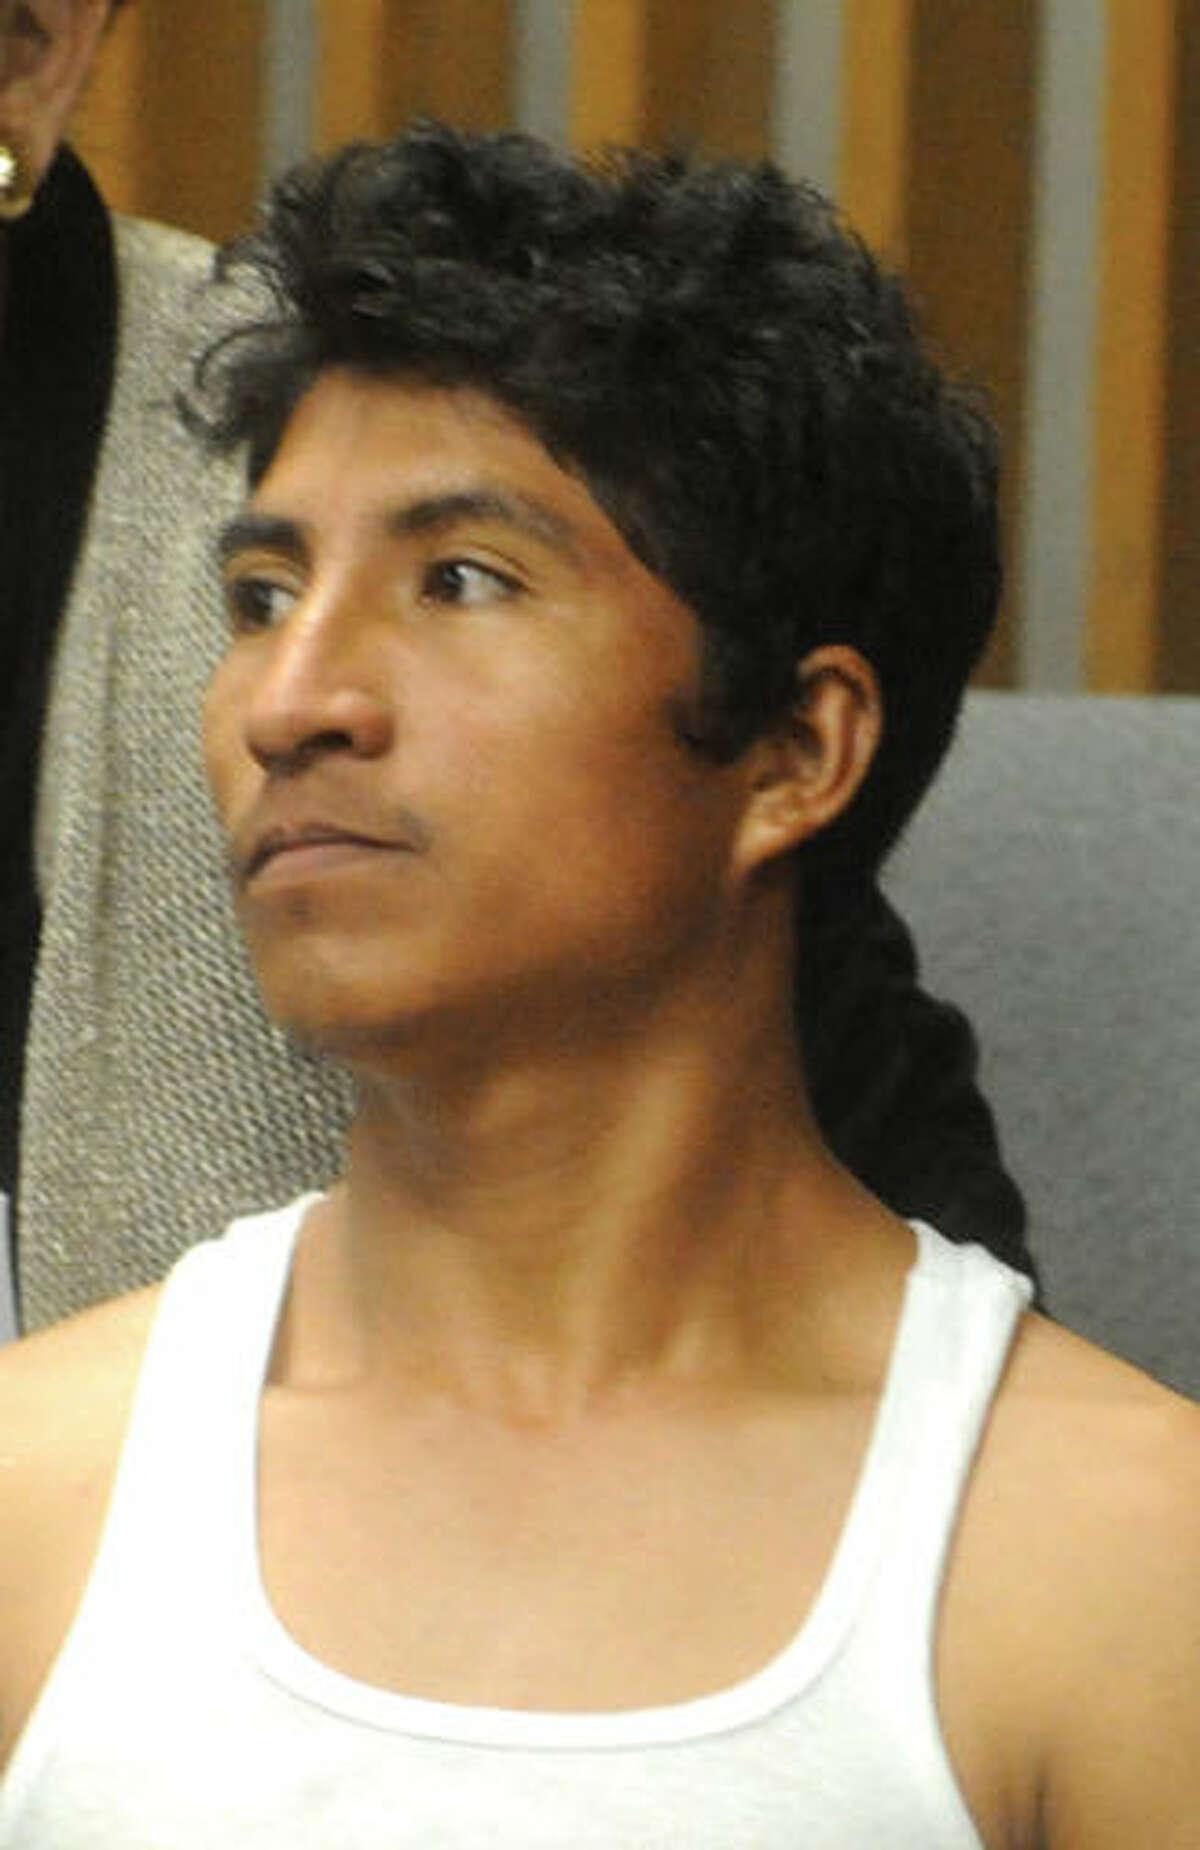 Hugo Cruz- Gregario arraignment at the Norwalk courthouse on Oct. 27. Hour photo/Matthew Vinci